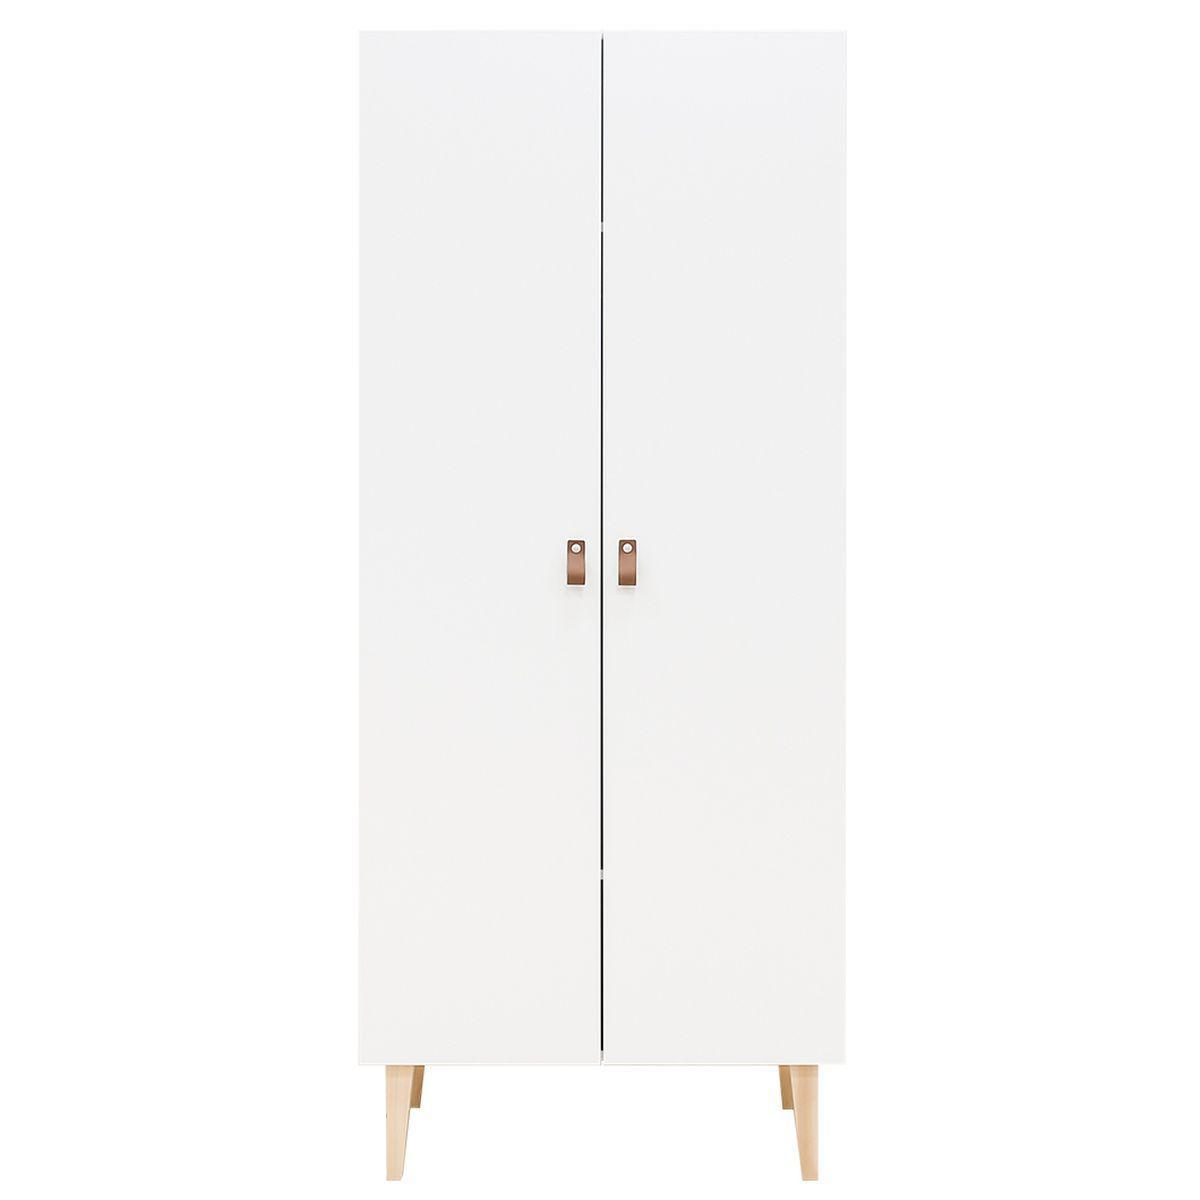 Armario 2 puertas INDY Bopita blanco-natural